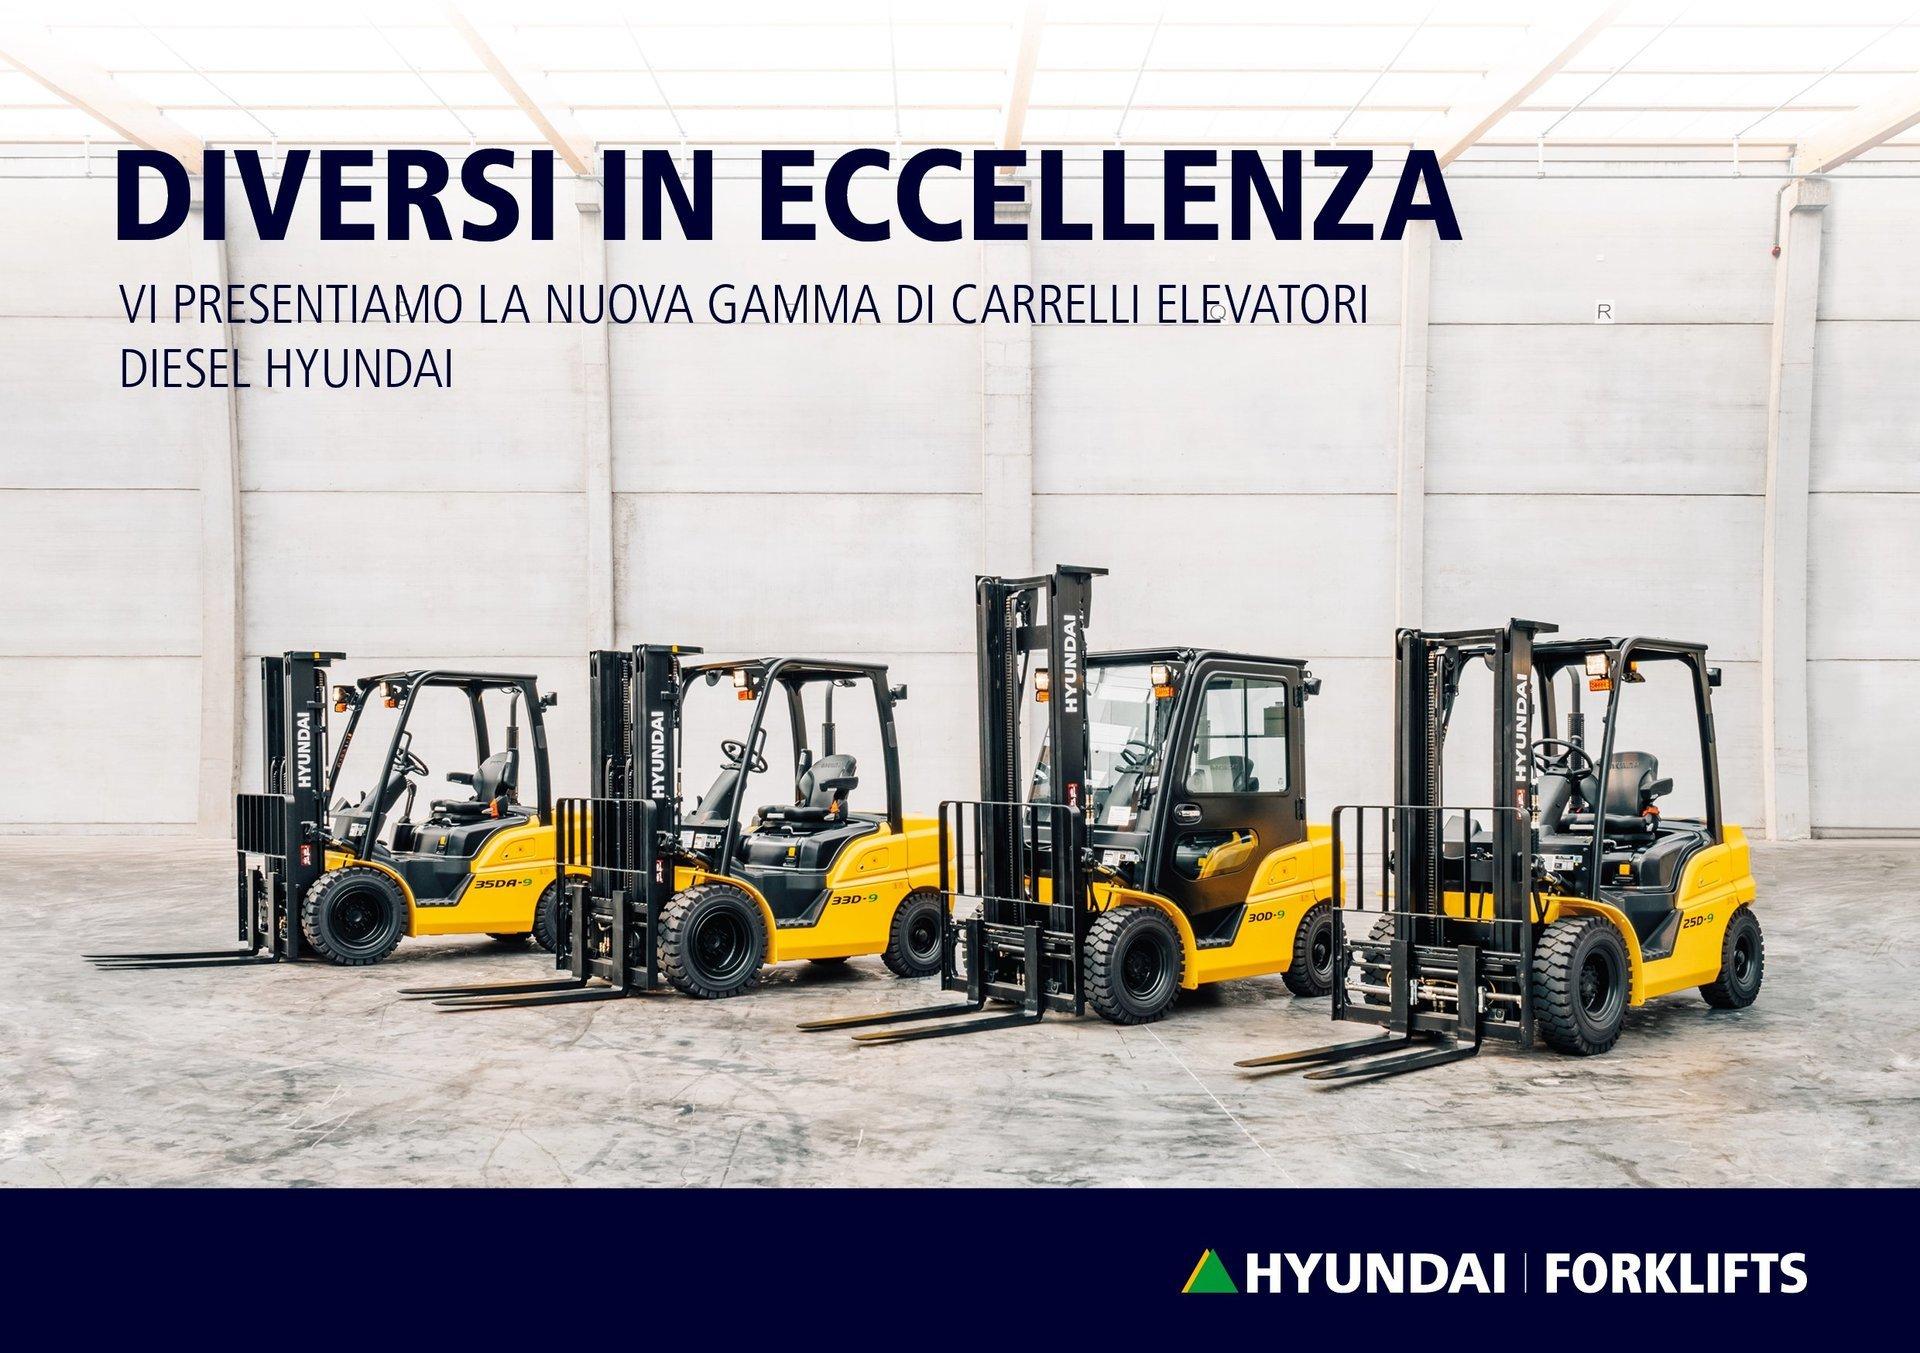 carrelli elevatori diesel hyundai con prestazioni superiori